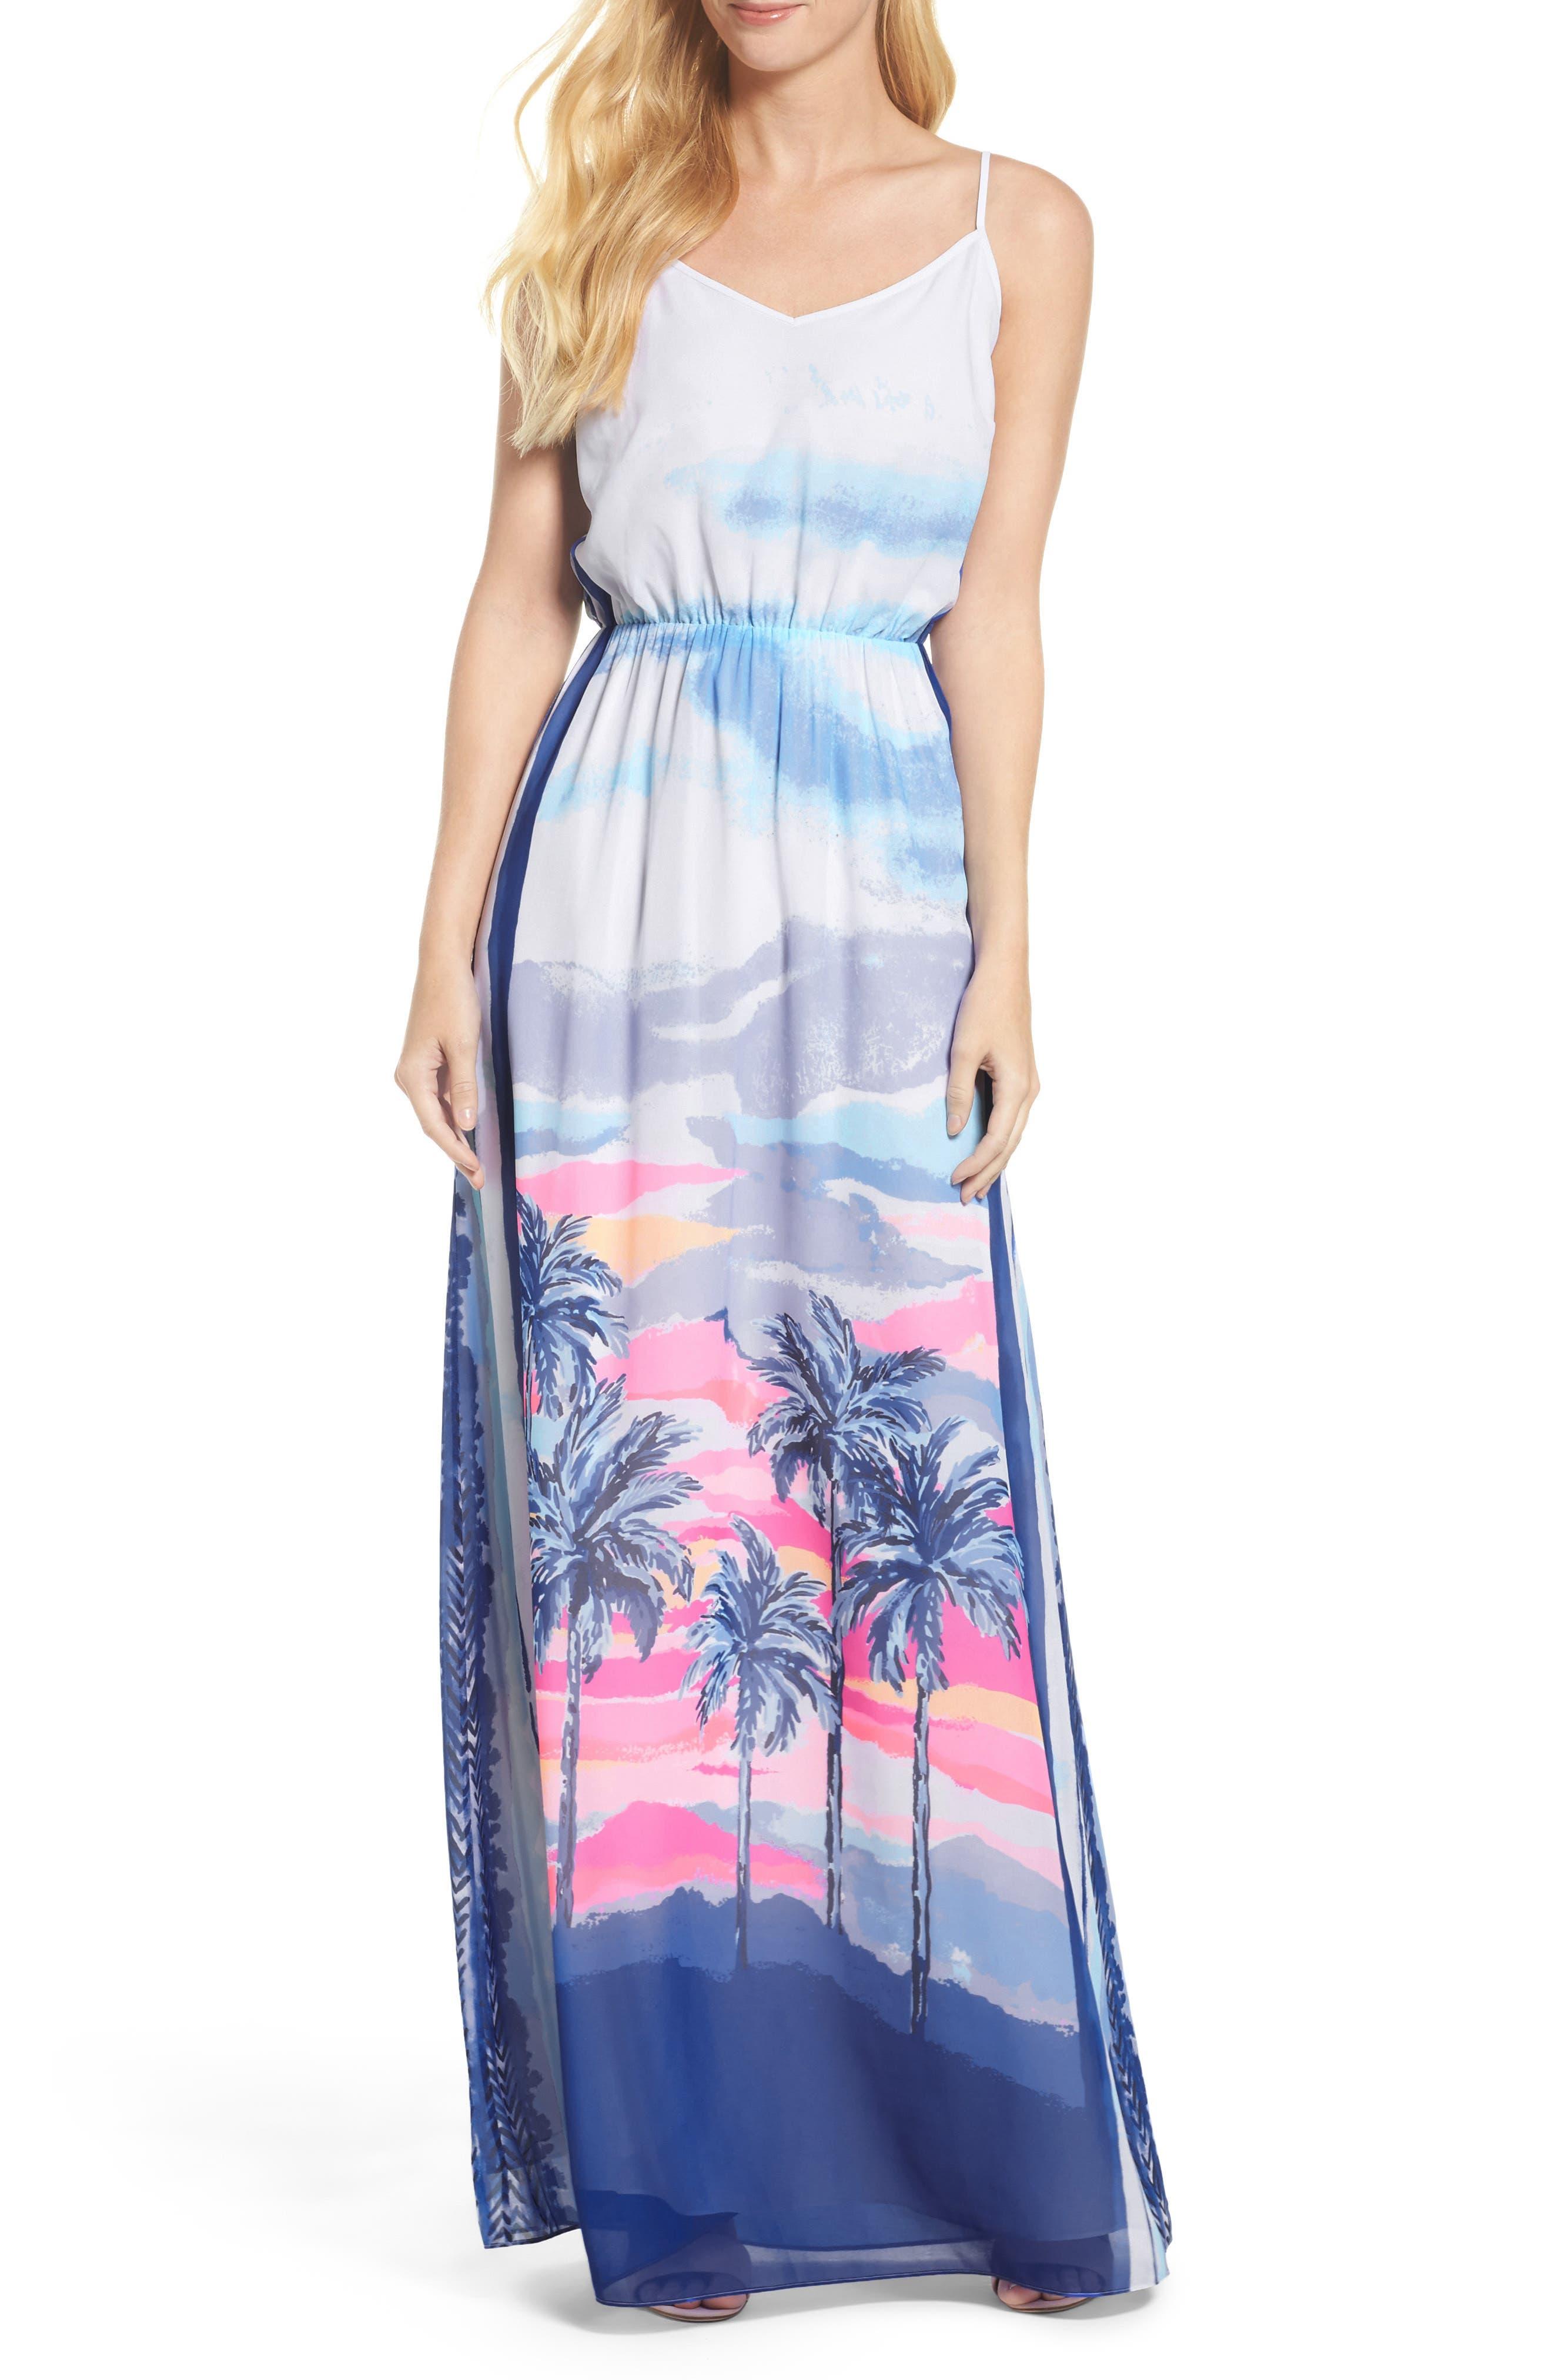 Deanna Maxi Dress,                             Main thumbnail 1, color,                             697